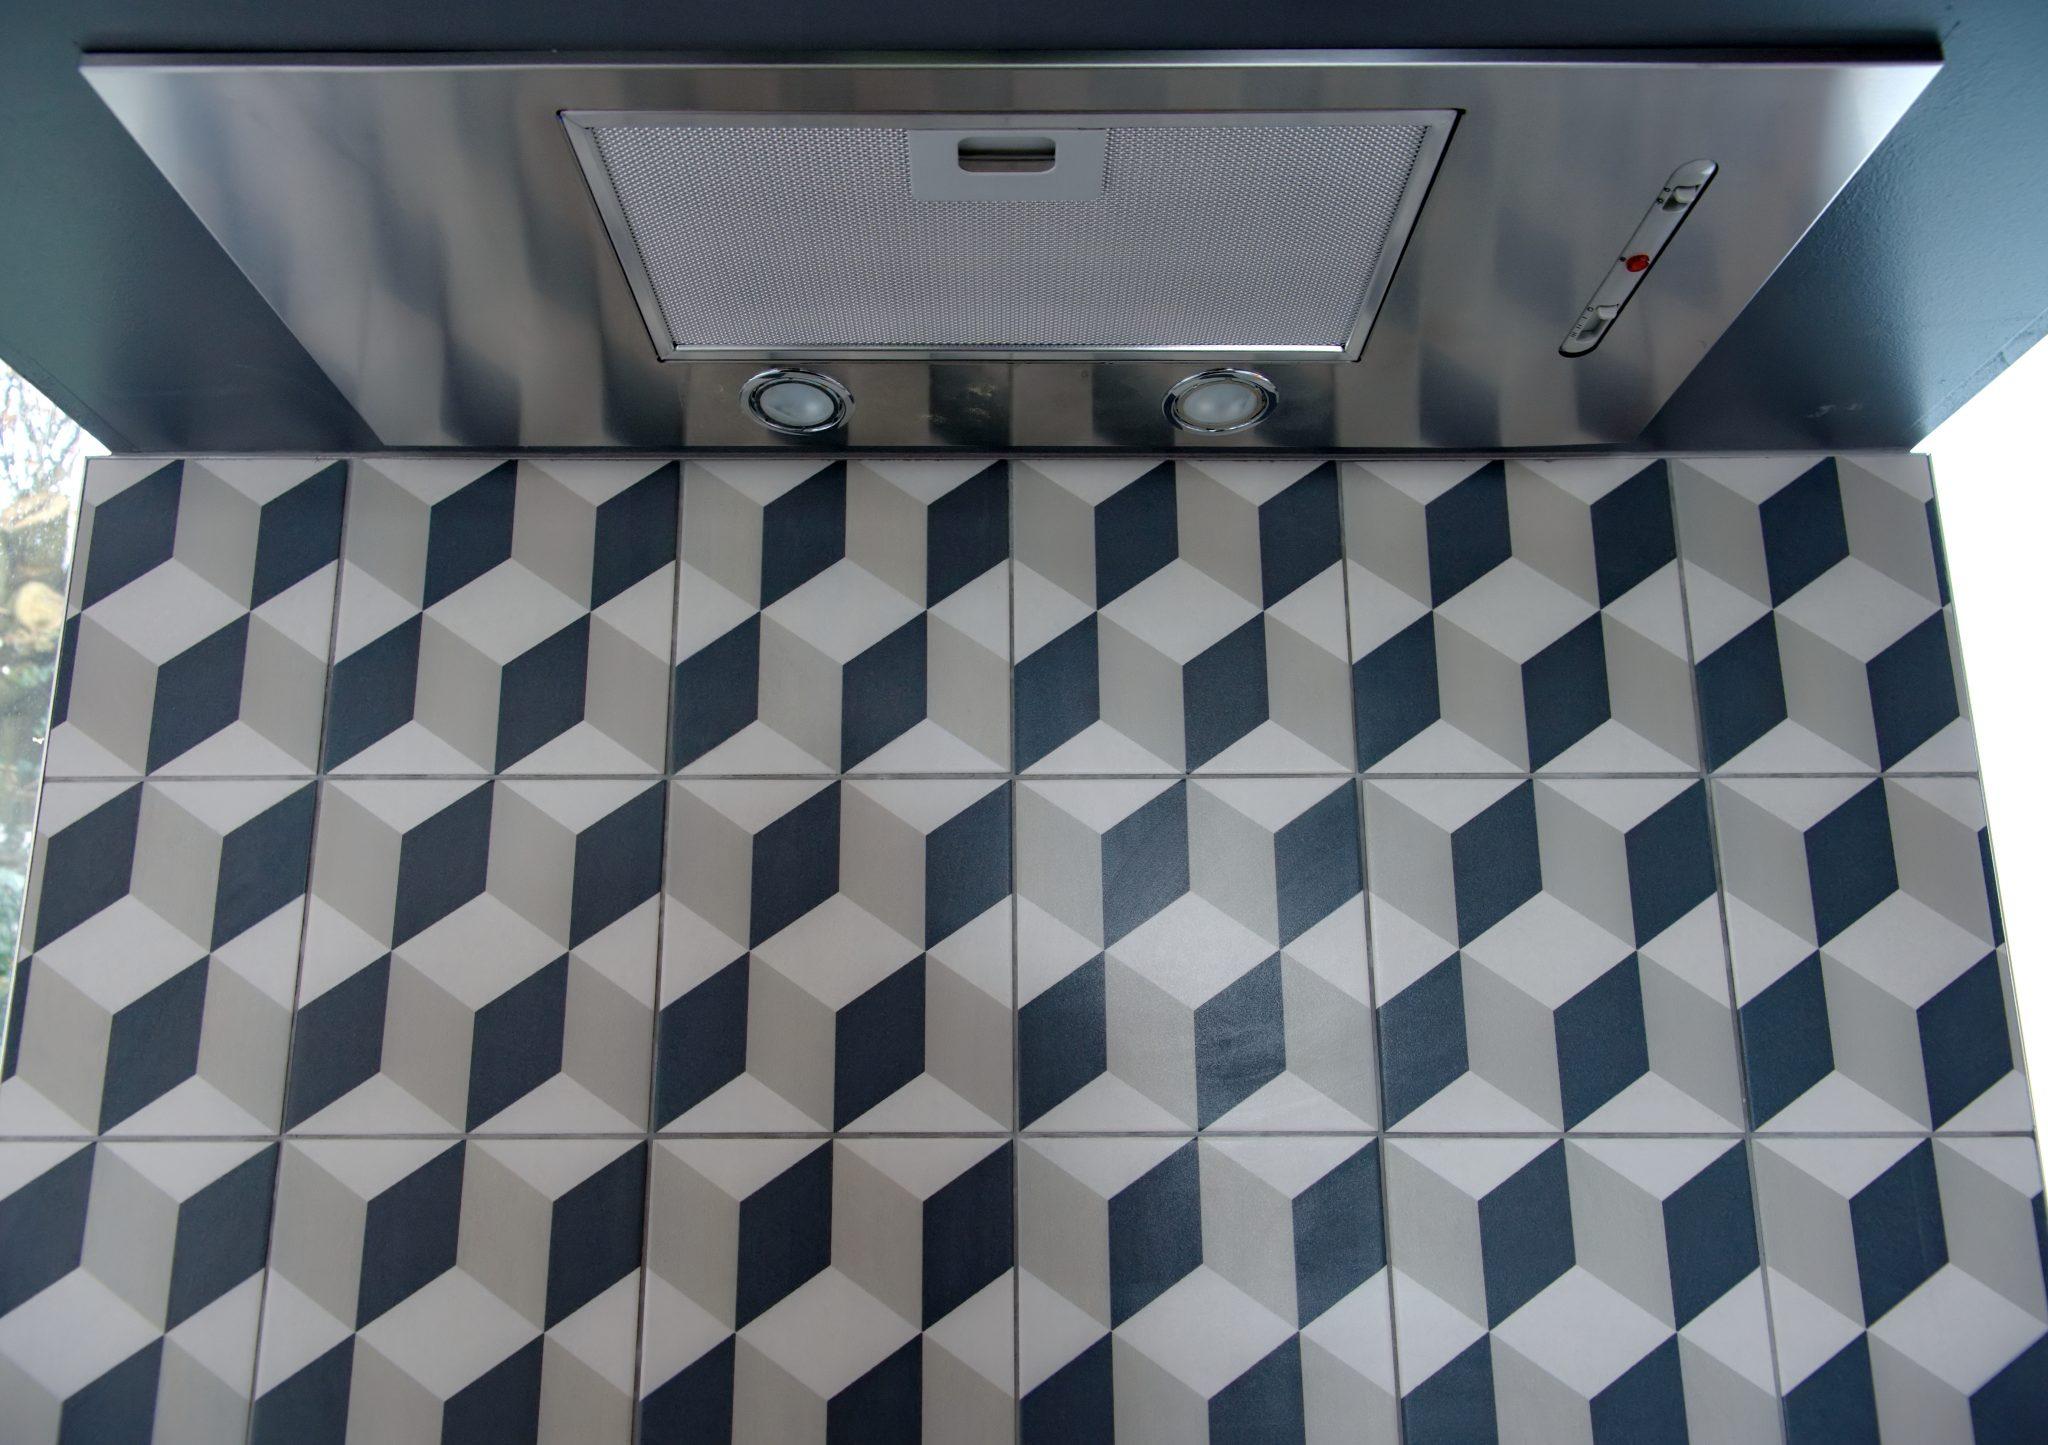 Geometric Tiles-Adornas Kitchens-Kitchens Bangor-Kitchens Belfast-Kitchen showrooms bangor-Modern Kitchens-German Kitchens-©AdornasKitchens2017